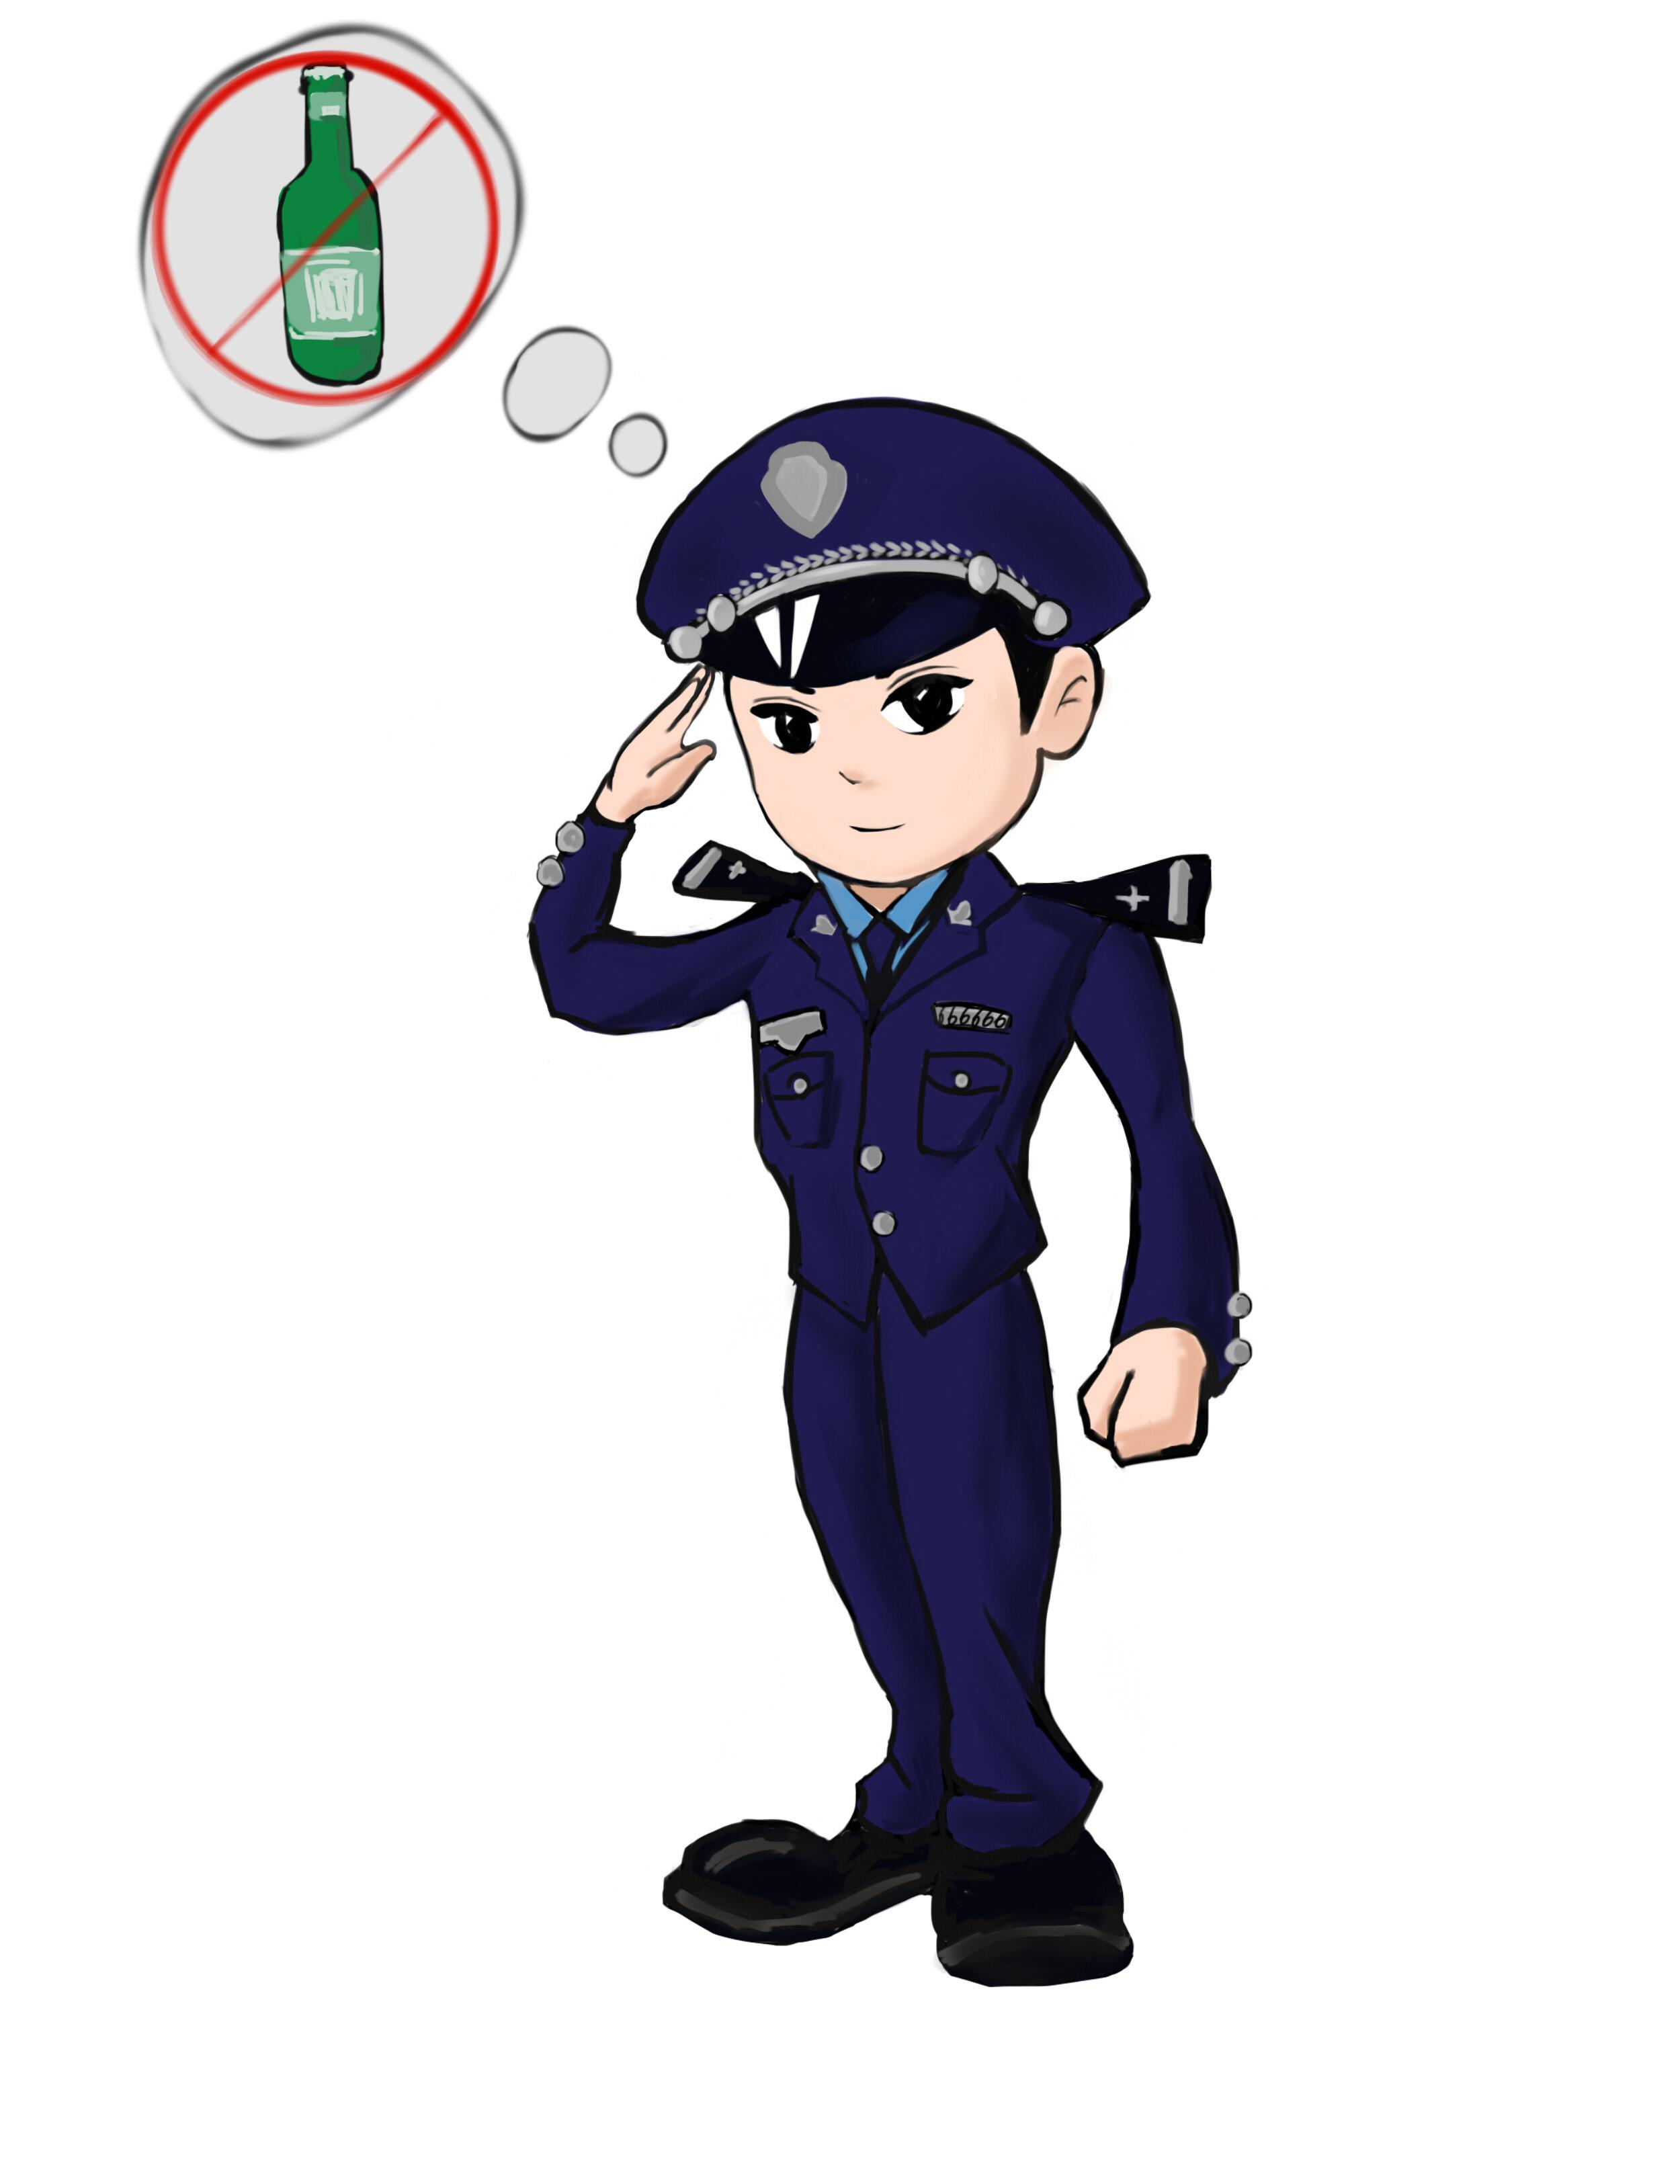 cdr  工商卡通形象.psd  手绘警察剪影插画矢量素材.图片